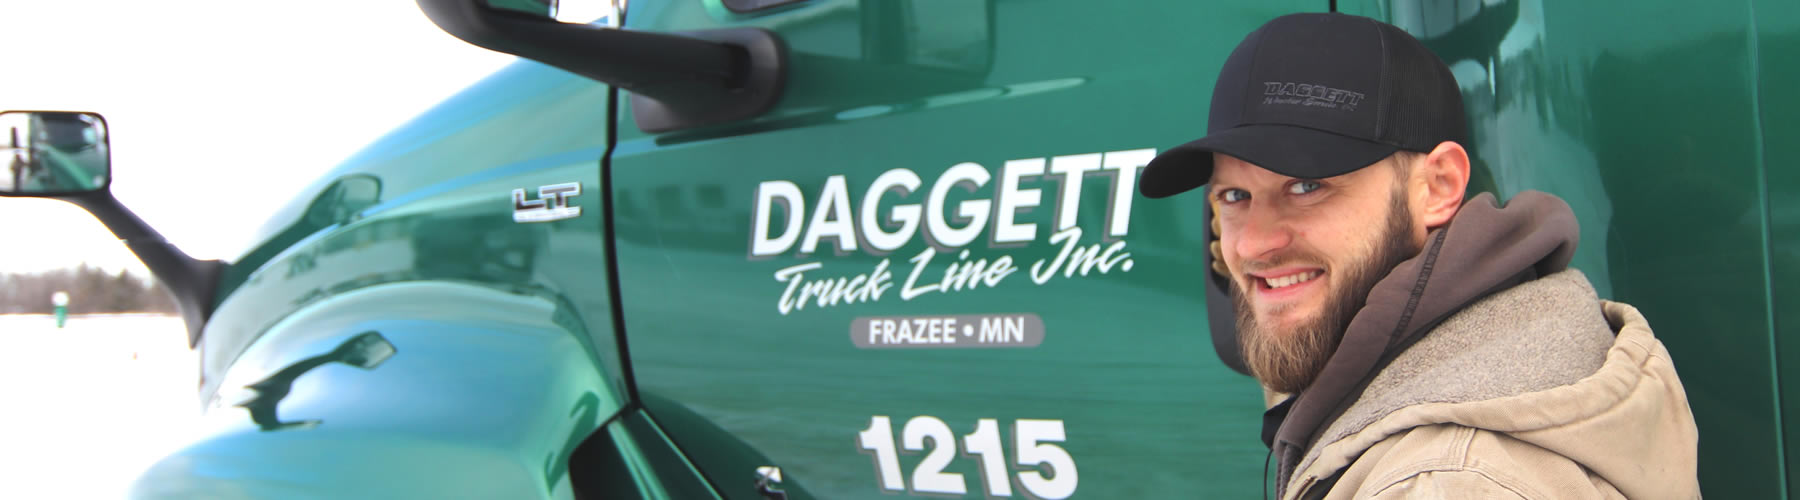 Get a great truck driving job at Daggett Truck Line Inc.